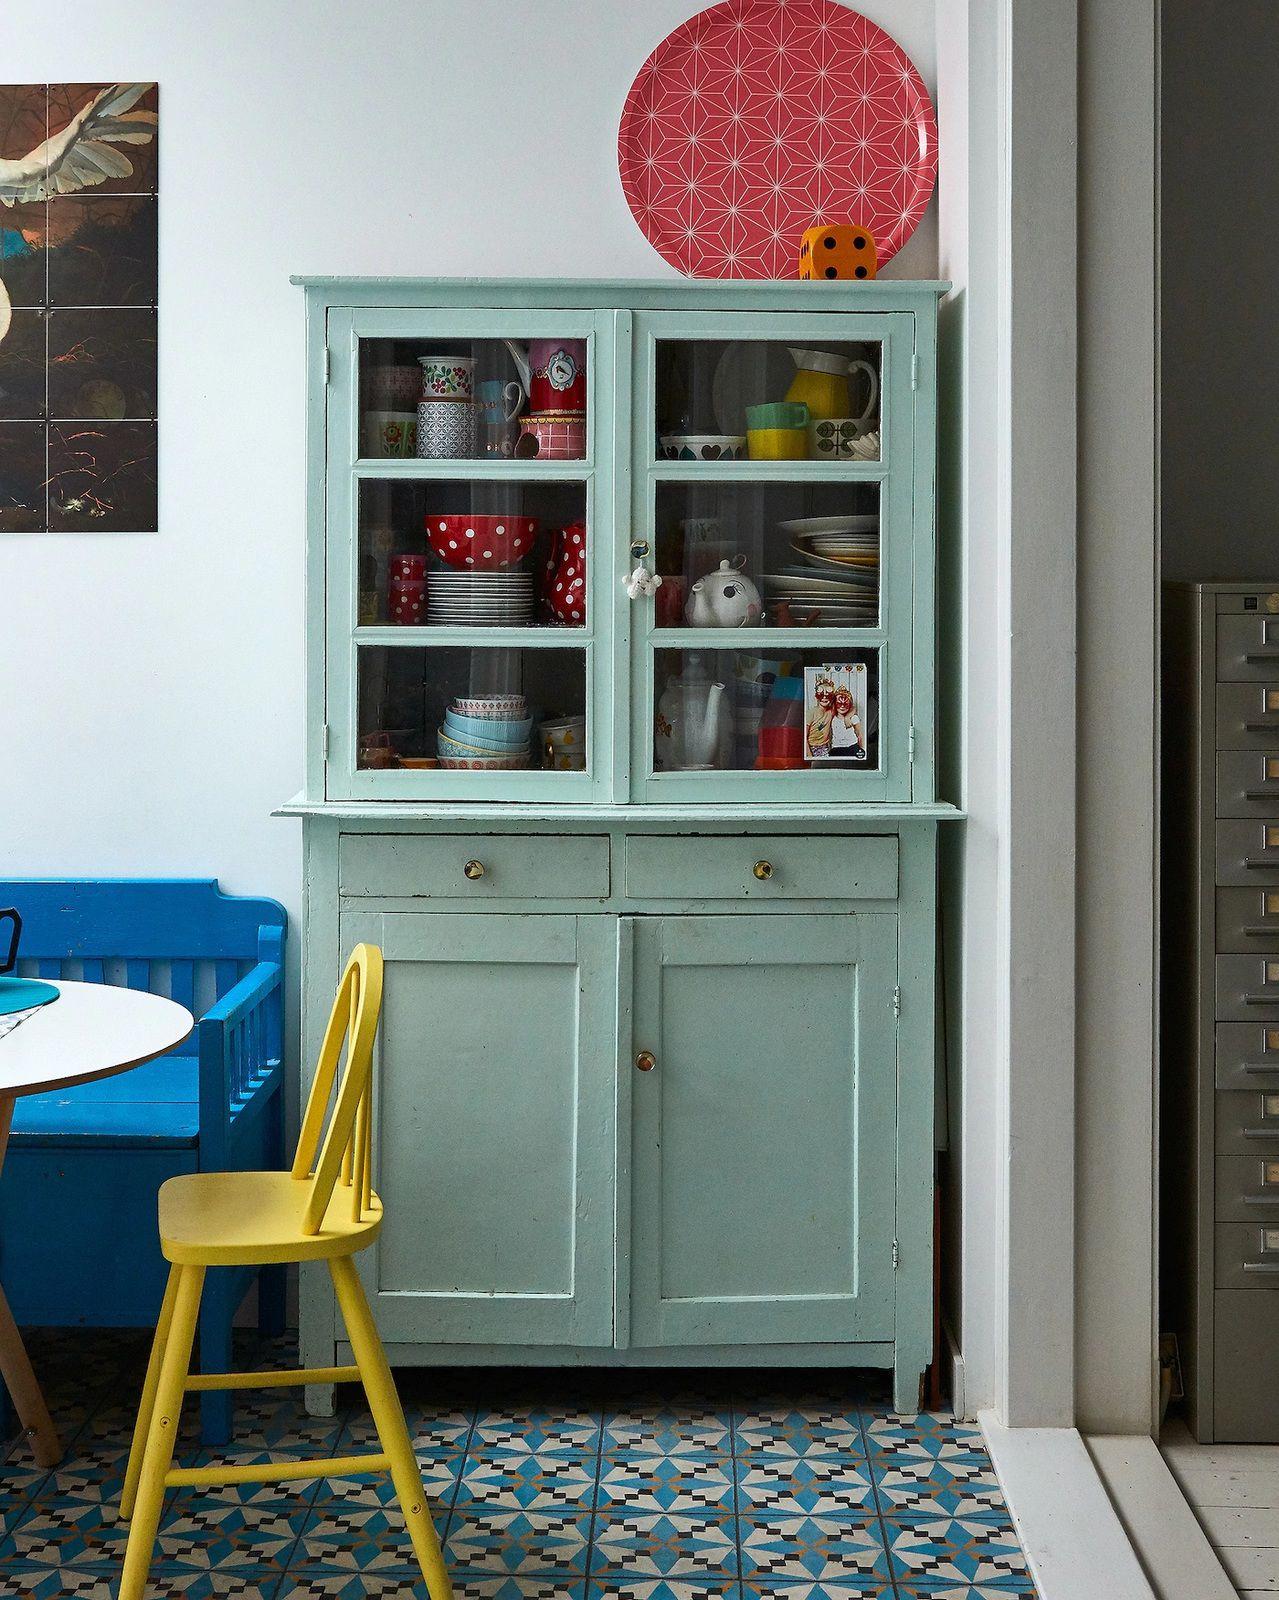 Customisation Décopatch, Customisation, Customize your furniture with paint, customisez, meubles-avec-de-la-peinture, furniture, painting, customisations des meubles, Furniture Revamp imagek,